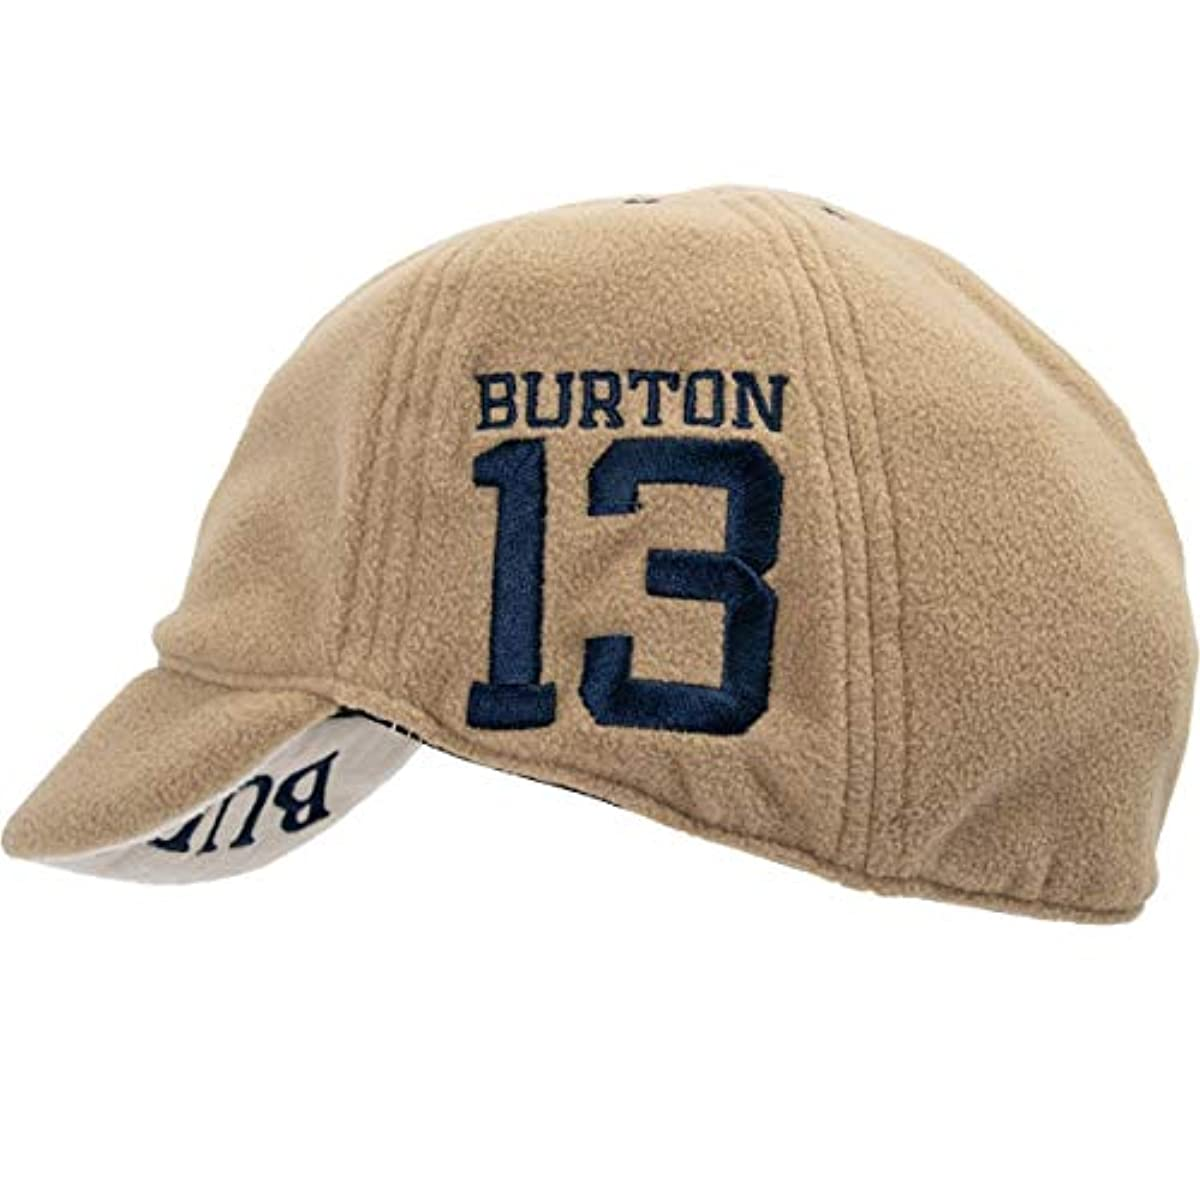 f14bc2a9666  해외  (버튼) BURTON PLAYER FLEECE CAP 플레이어 플리스(fleece) 캡